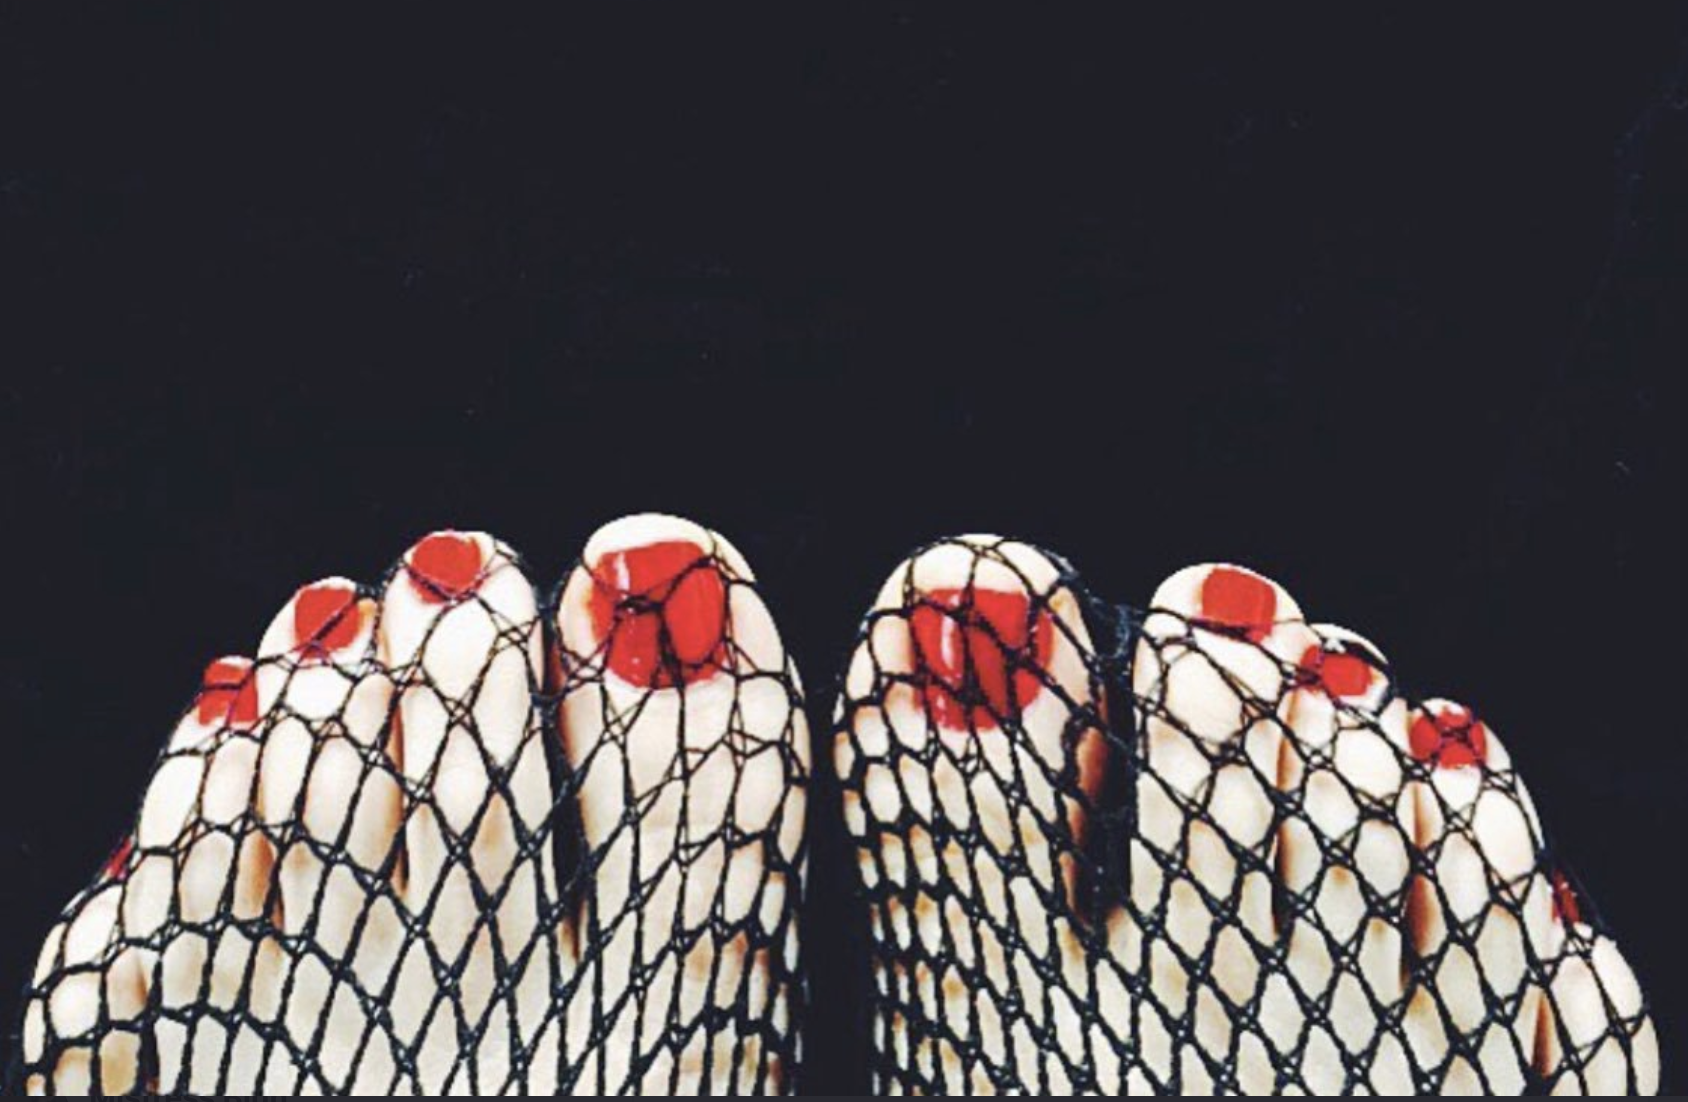 Mistress Blunt's perfect feet in fishnet foot fetish